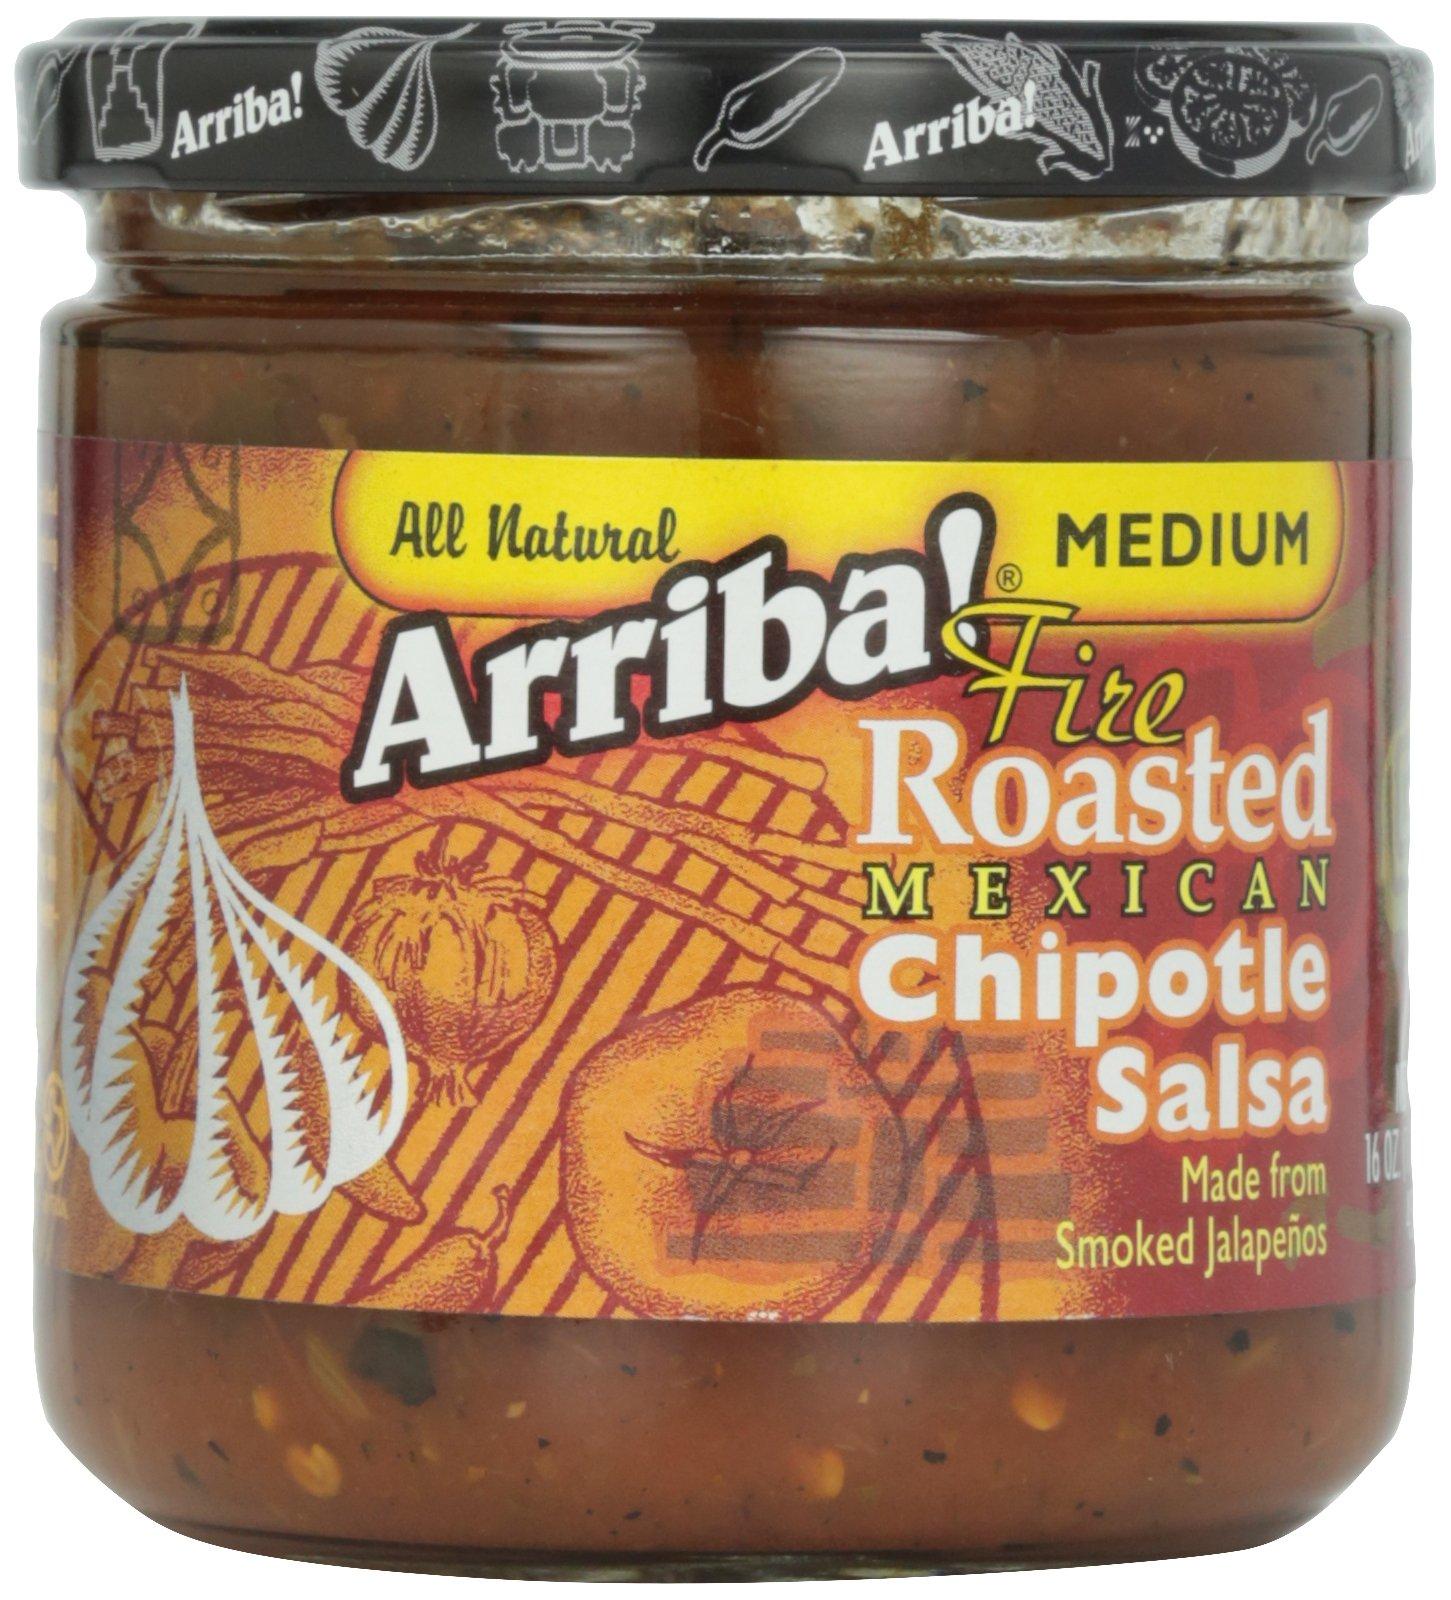 Arriba Chipotle Salsa, 16 oz